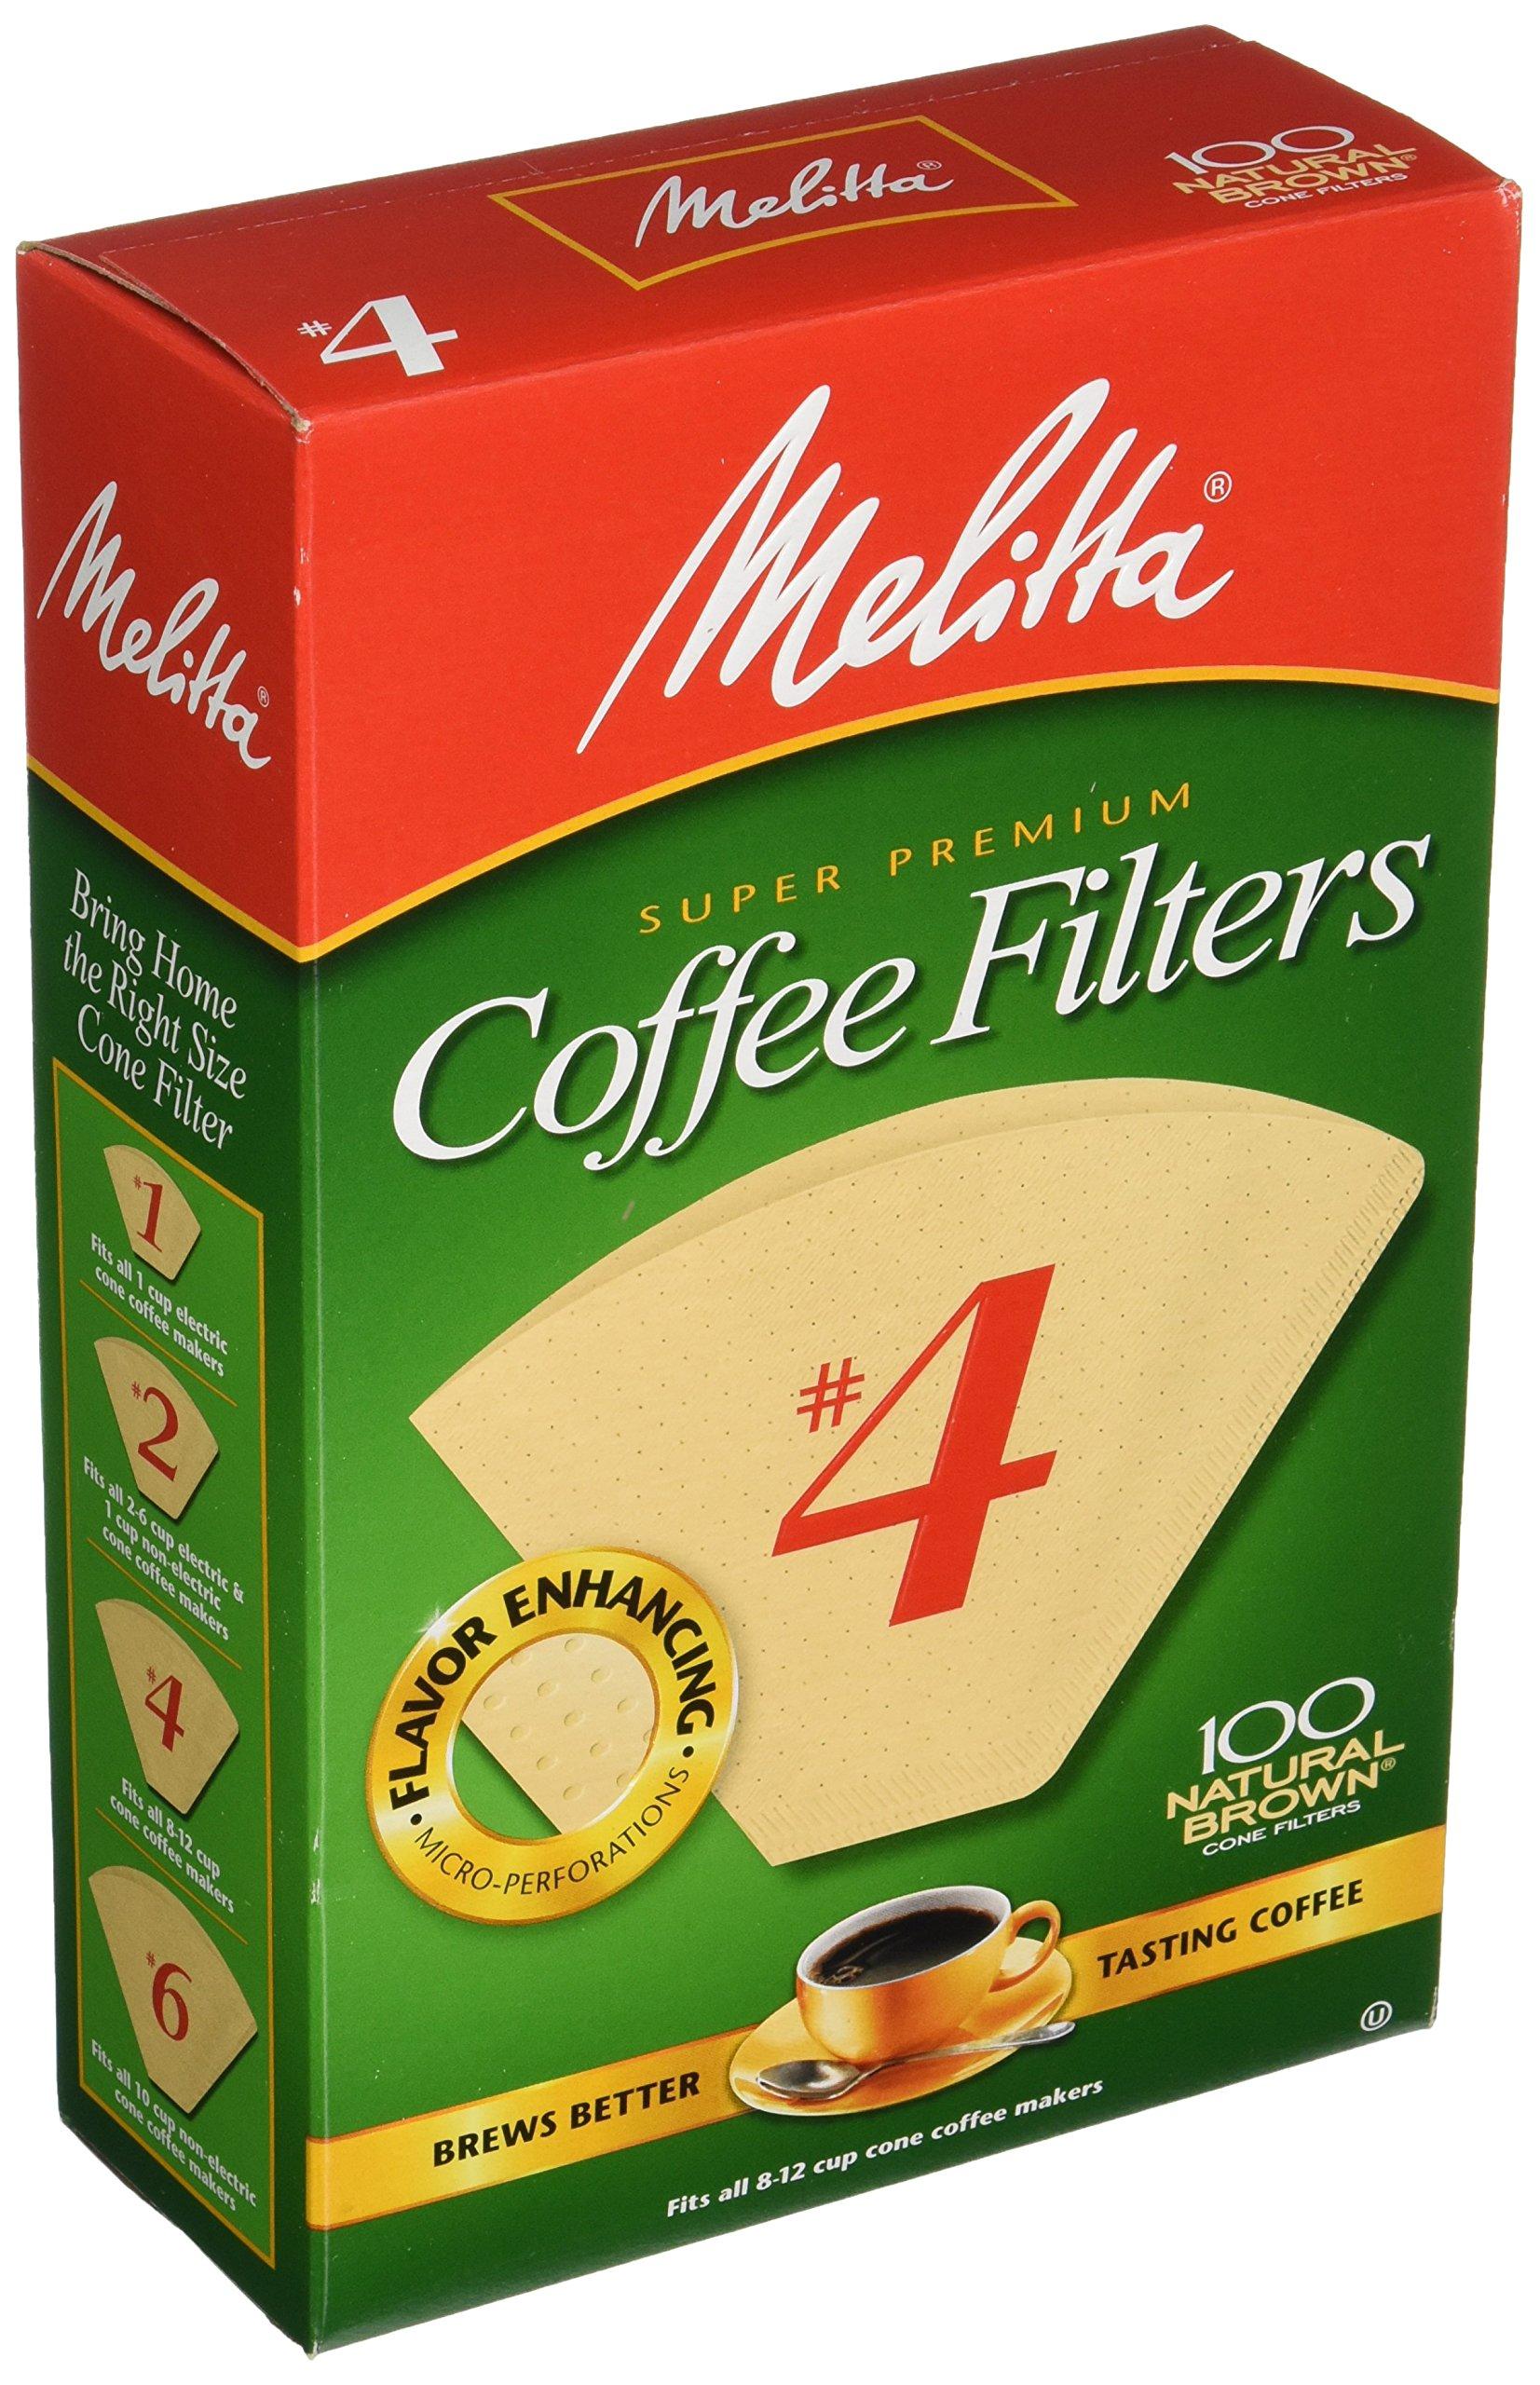 Melitta Super Premium Coffee Filters, Naturan Brown, No. 4, 100-Count Filters (Pack of 3)